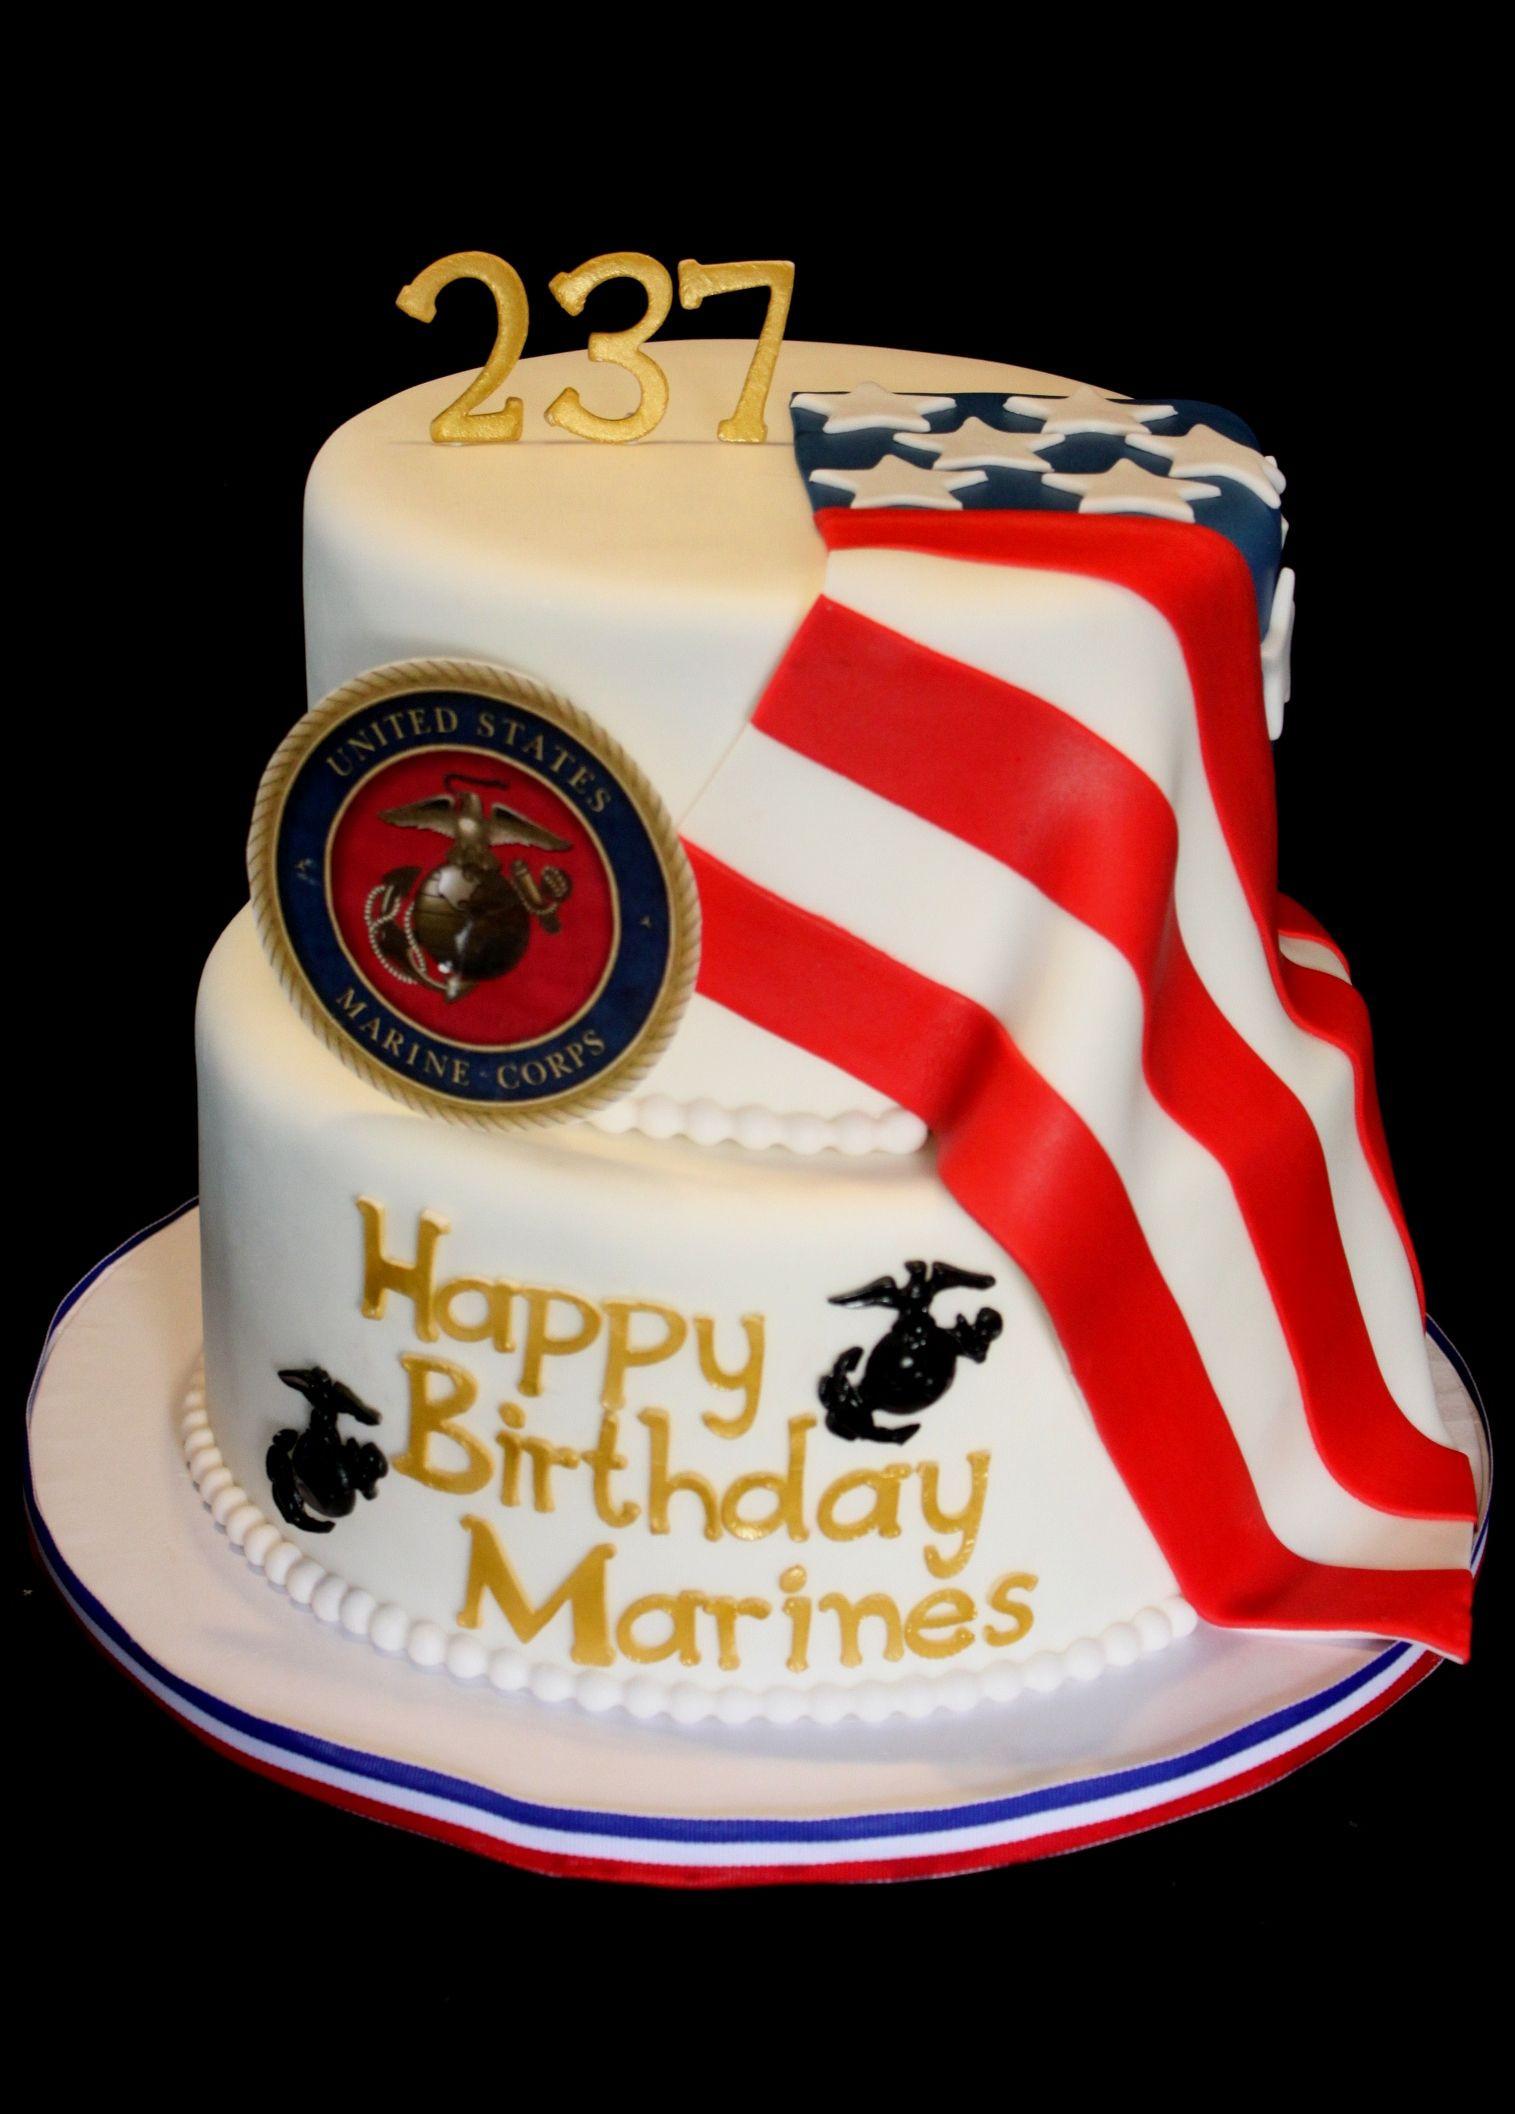 Best ideas about Marine Corp Birthday Cake . Save or Pin Marine Corps Birthday Cake Now.